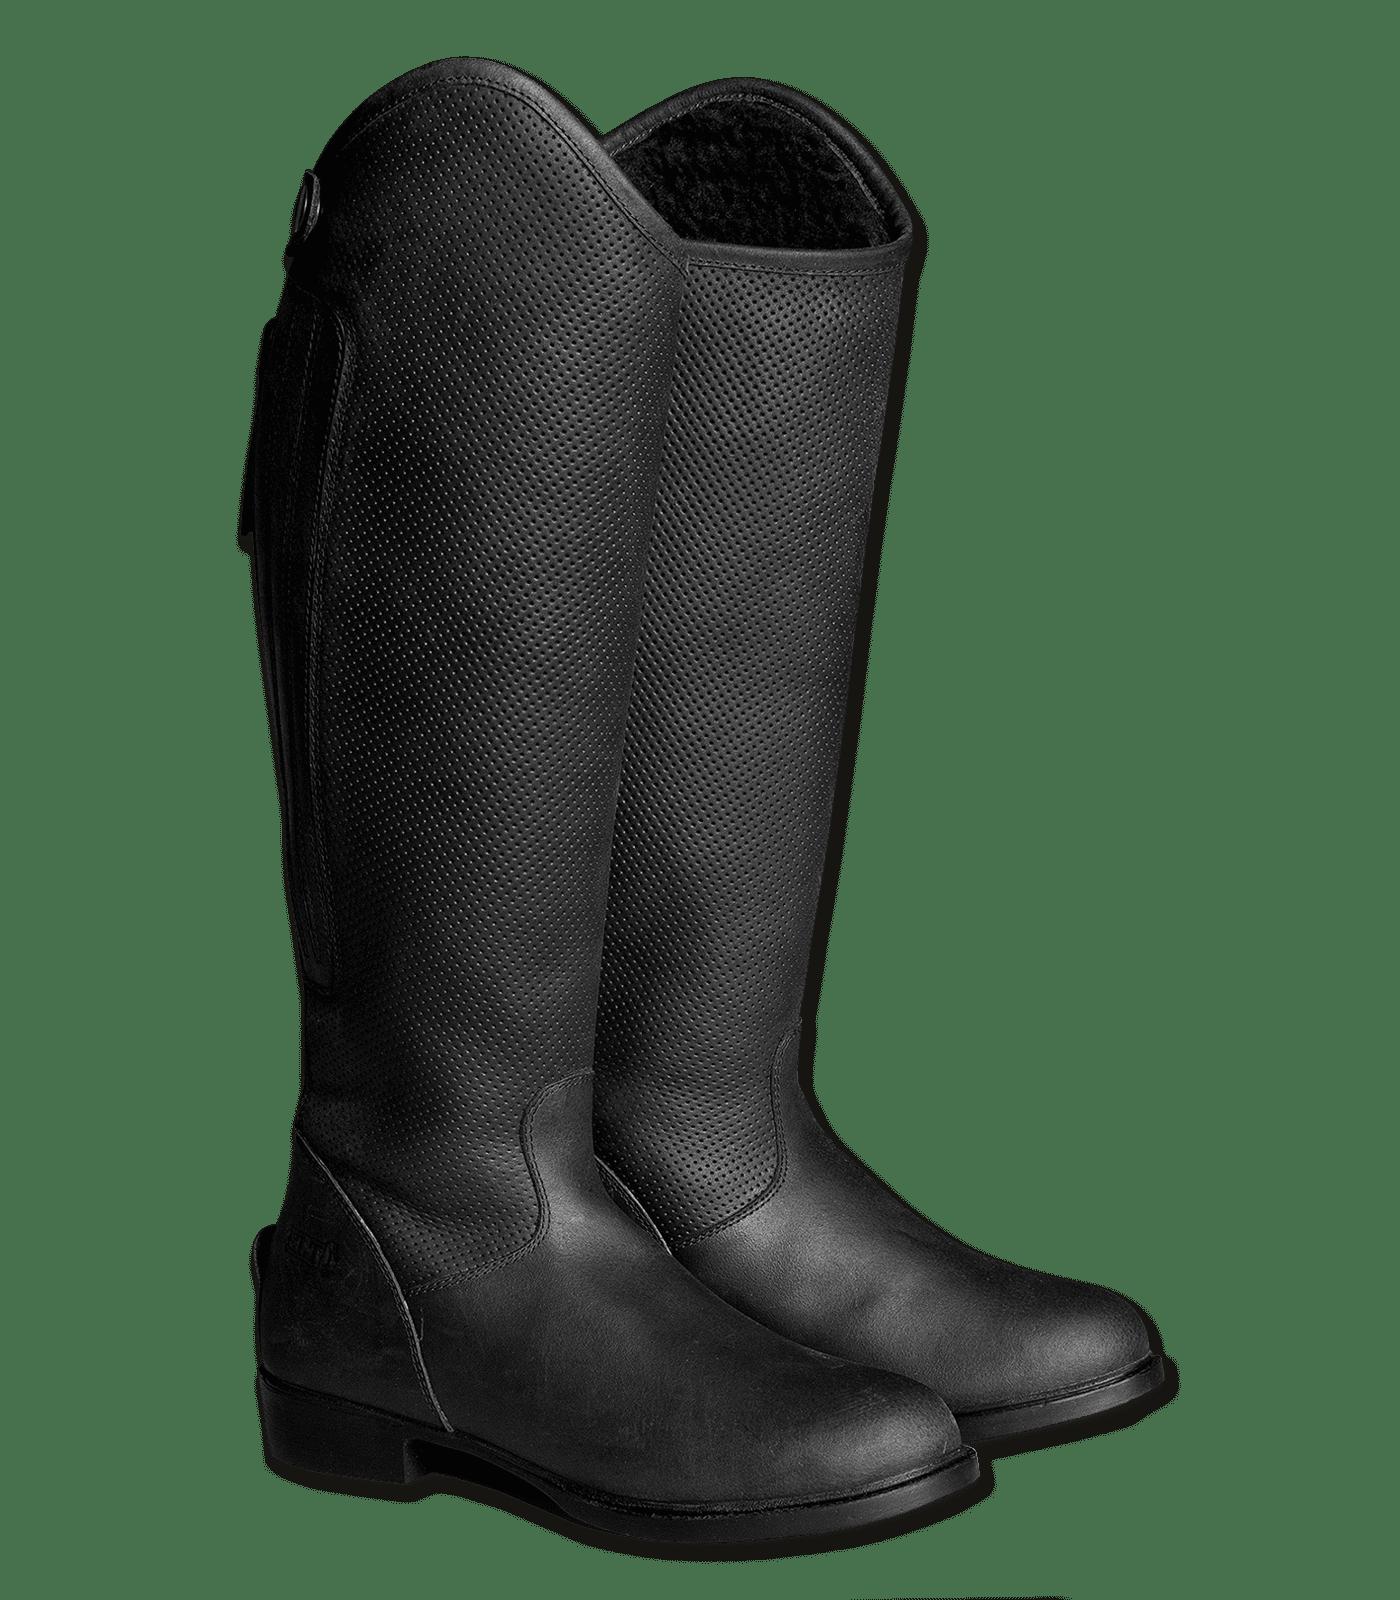 8c20473d1f885 Master jazdecké topánky, zimné   Jazdecké potreby El Thoro